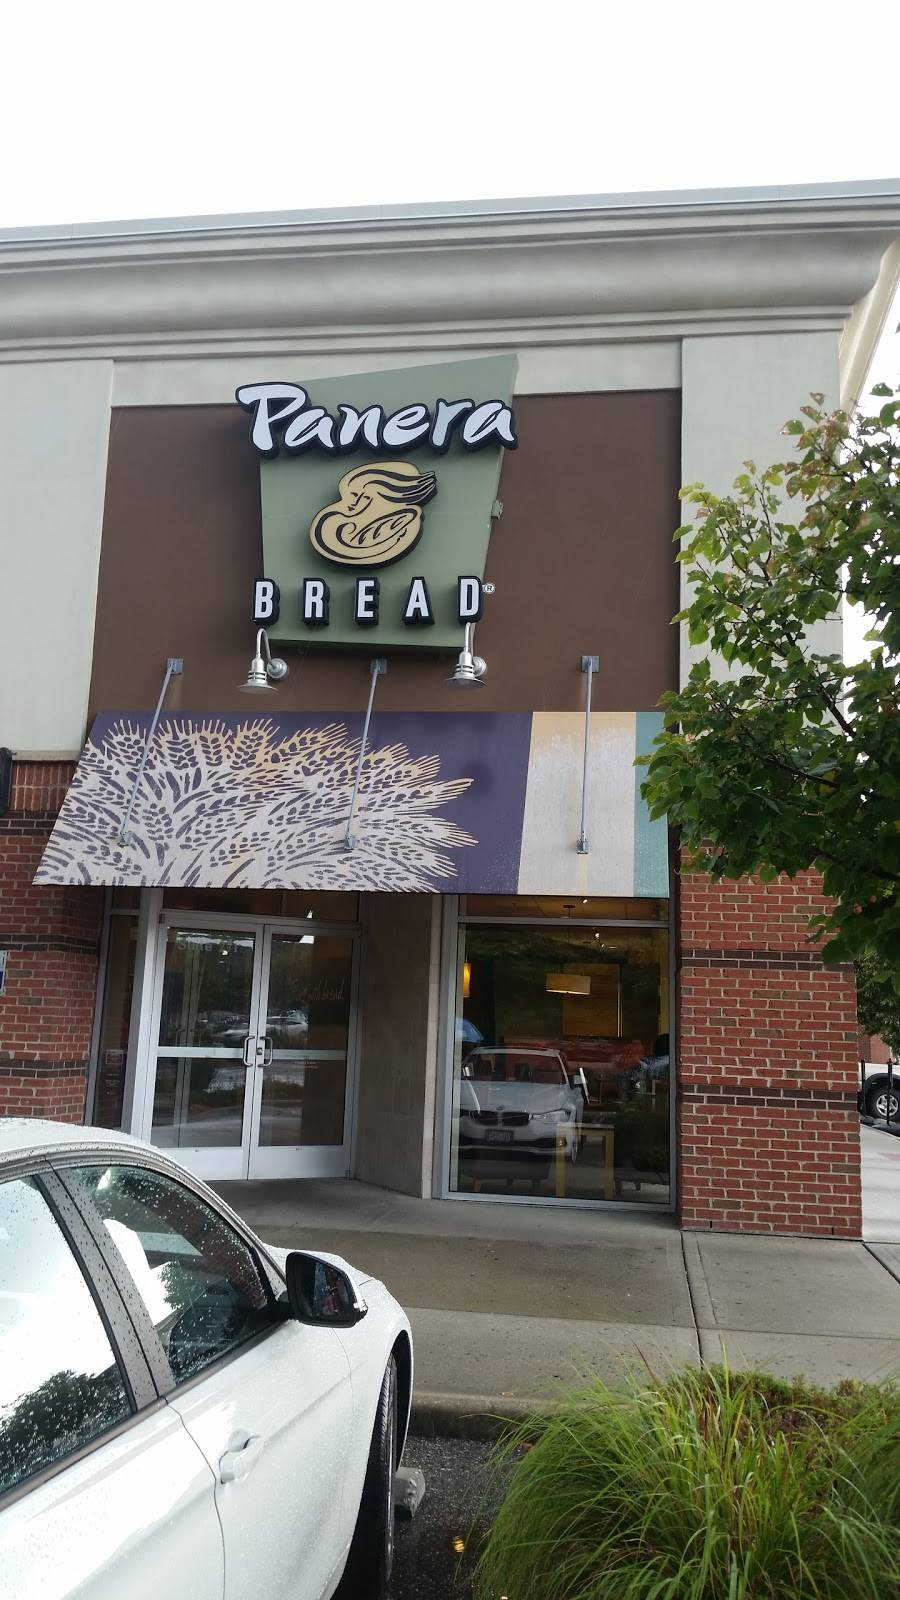 Panera Bread   bakery   12531 Jefferson Ave, Newport News, VA 23602, USA   7578908030 OR +1 757-890-8030